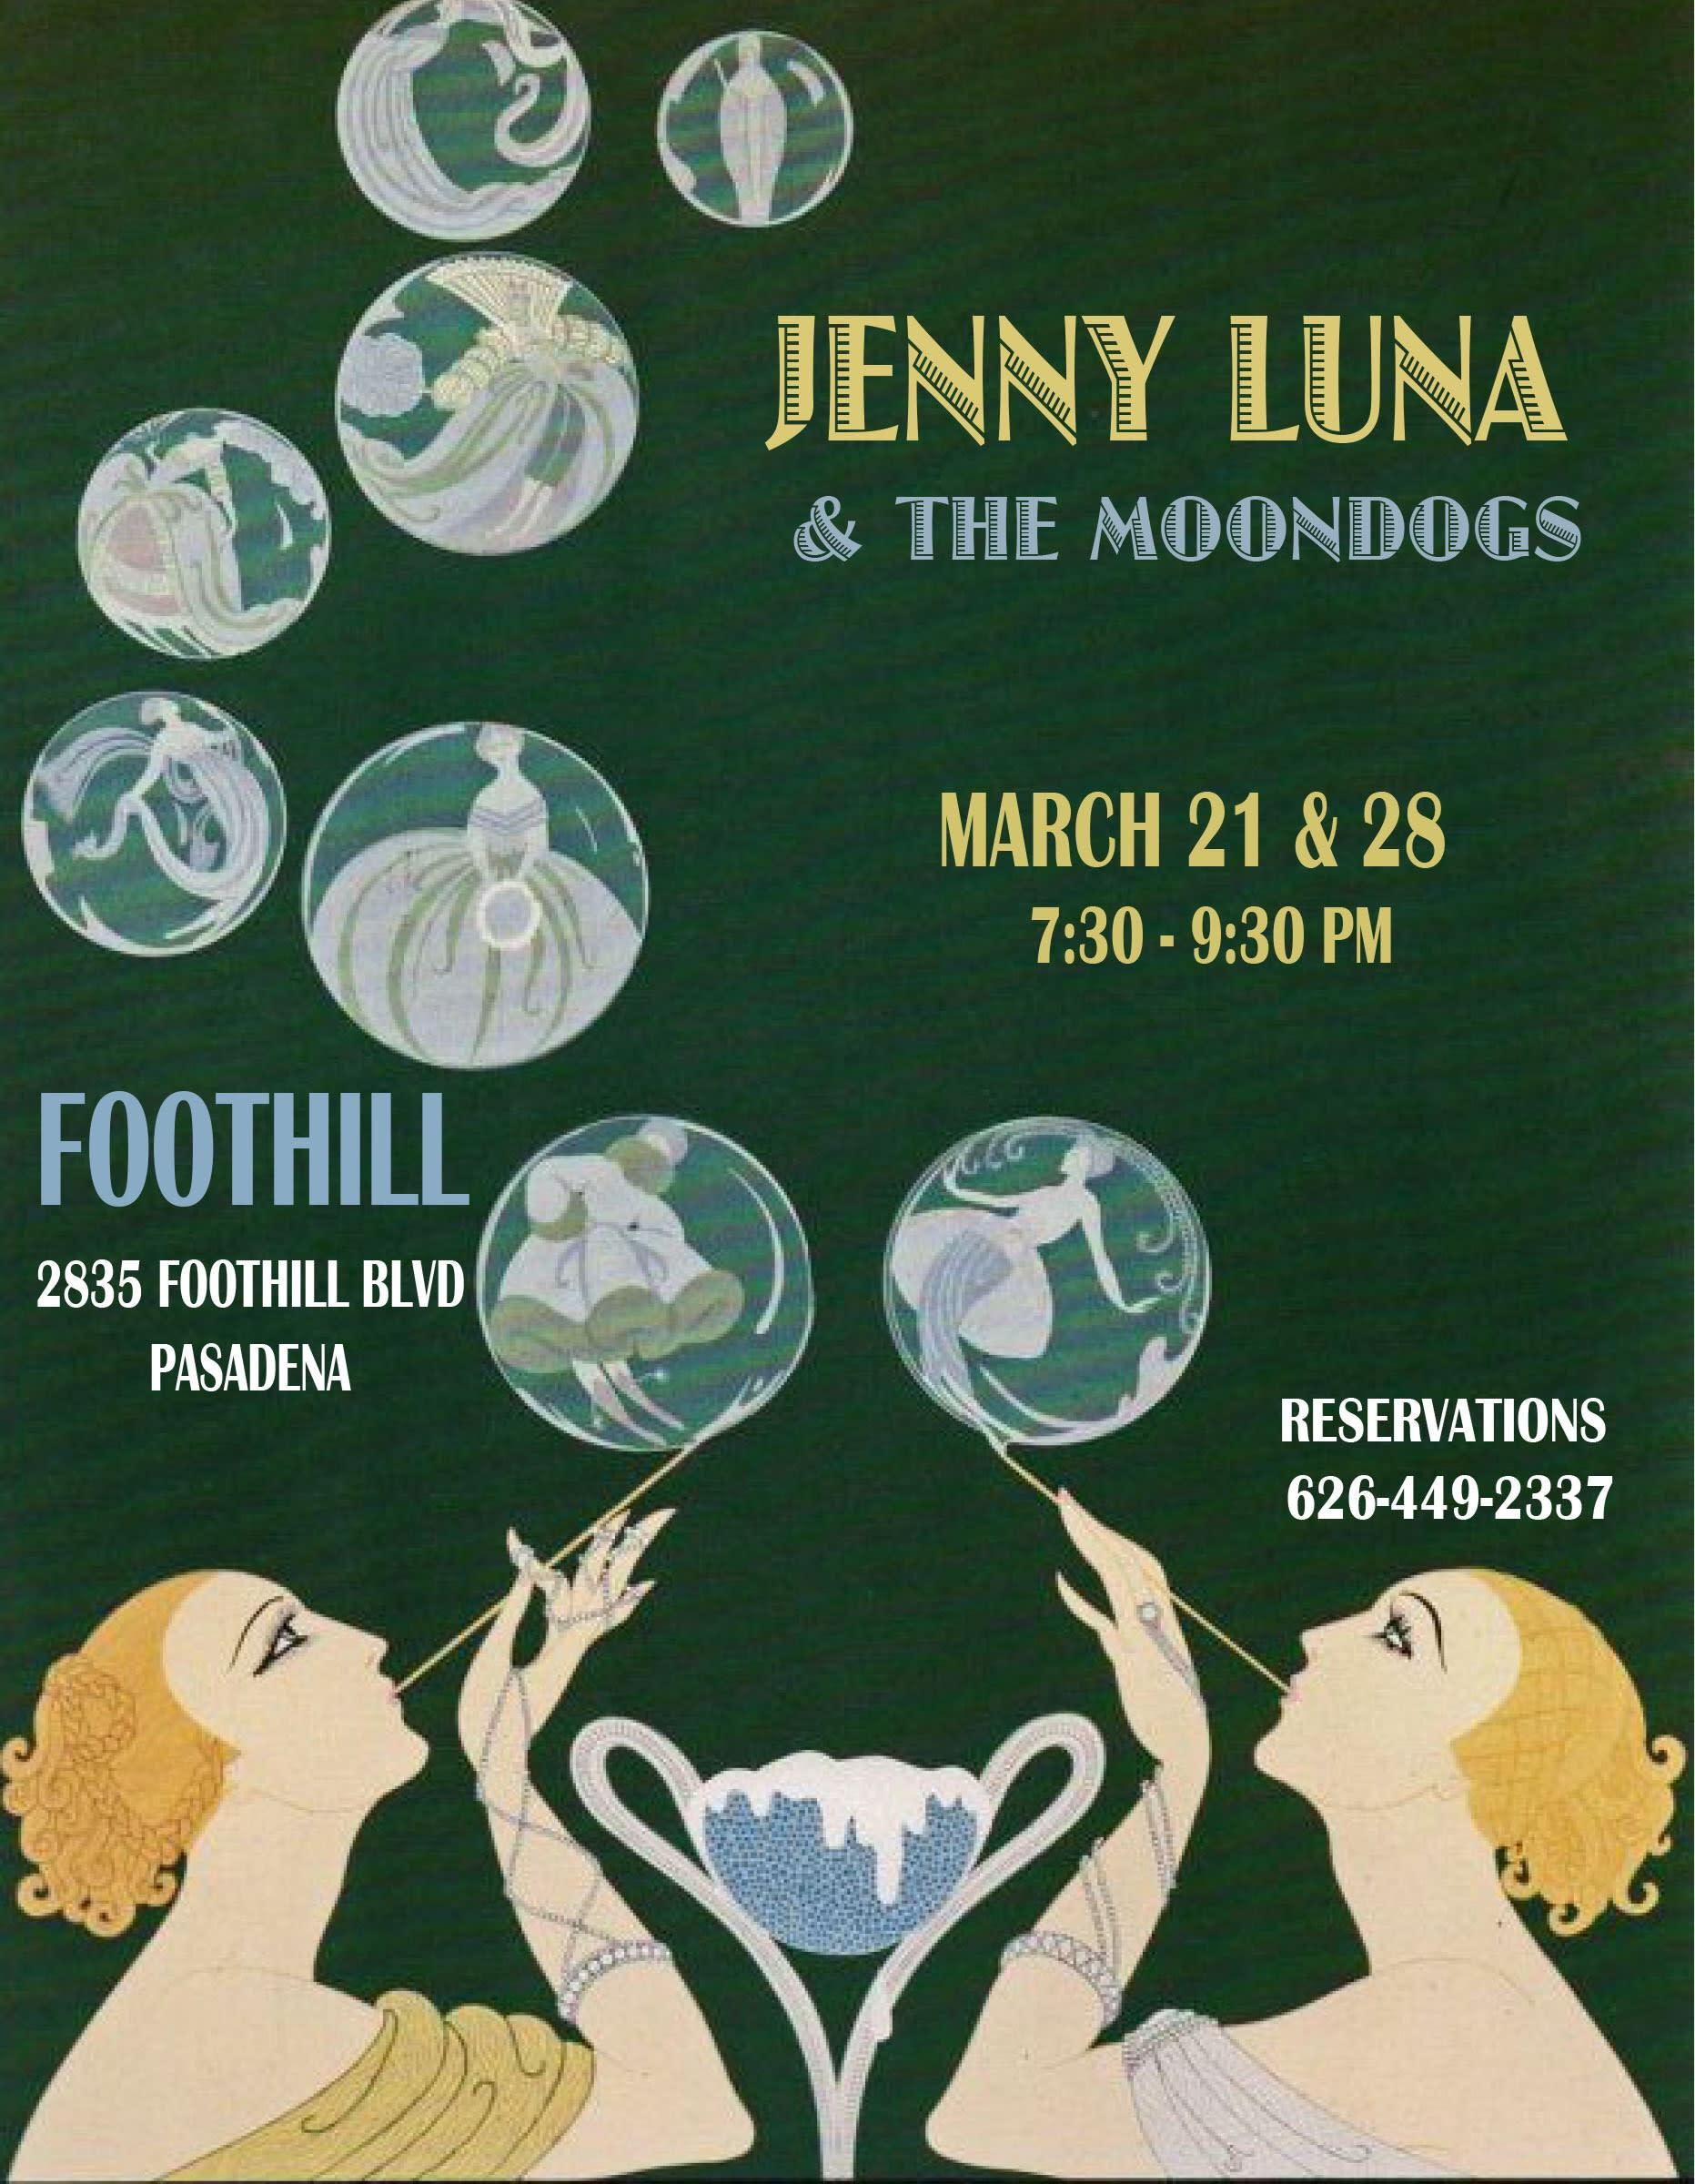 Jenny Luna + Moon dogs flyer